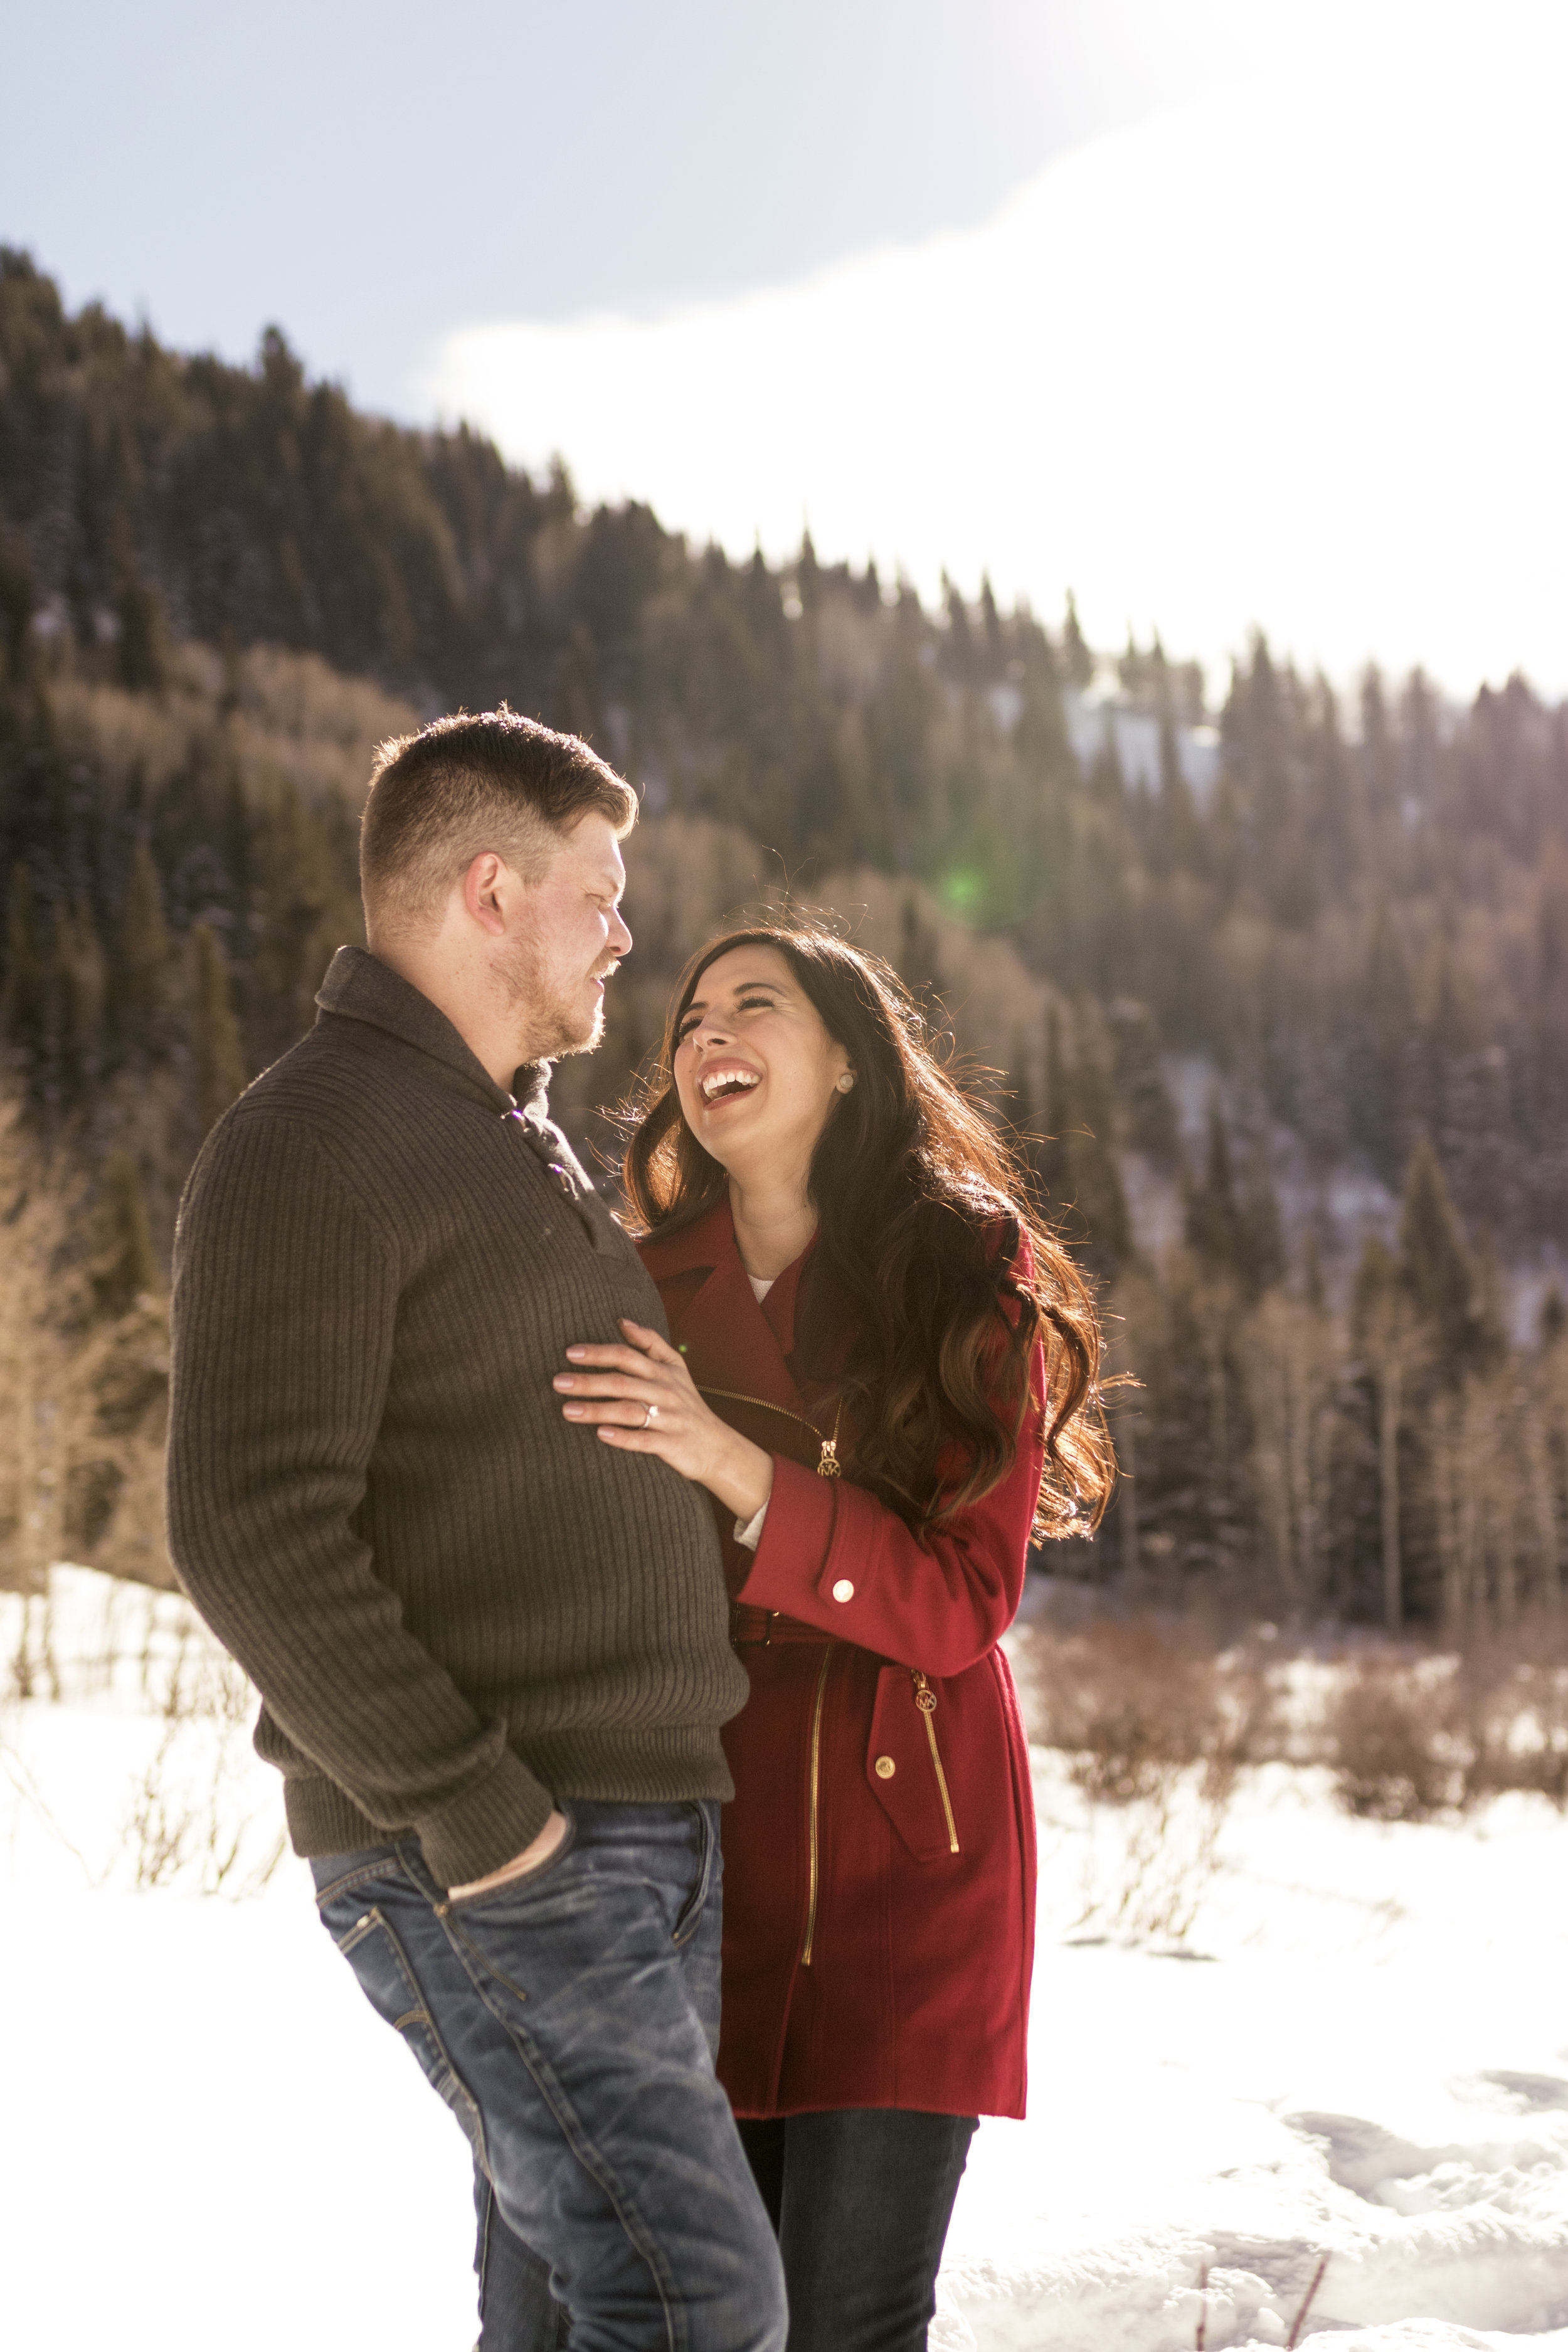 Snowey Utah Winter Engagements in Little Cottonwood Canyon by Bri Bergman Photography07.jpg